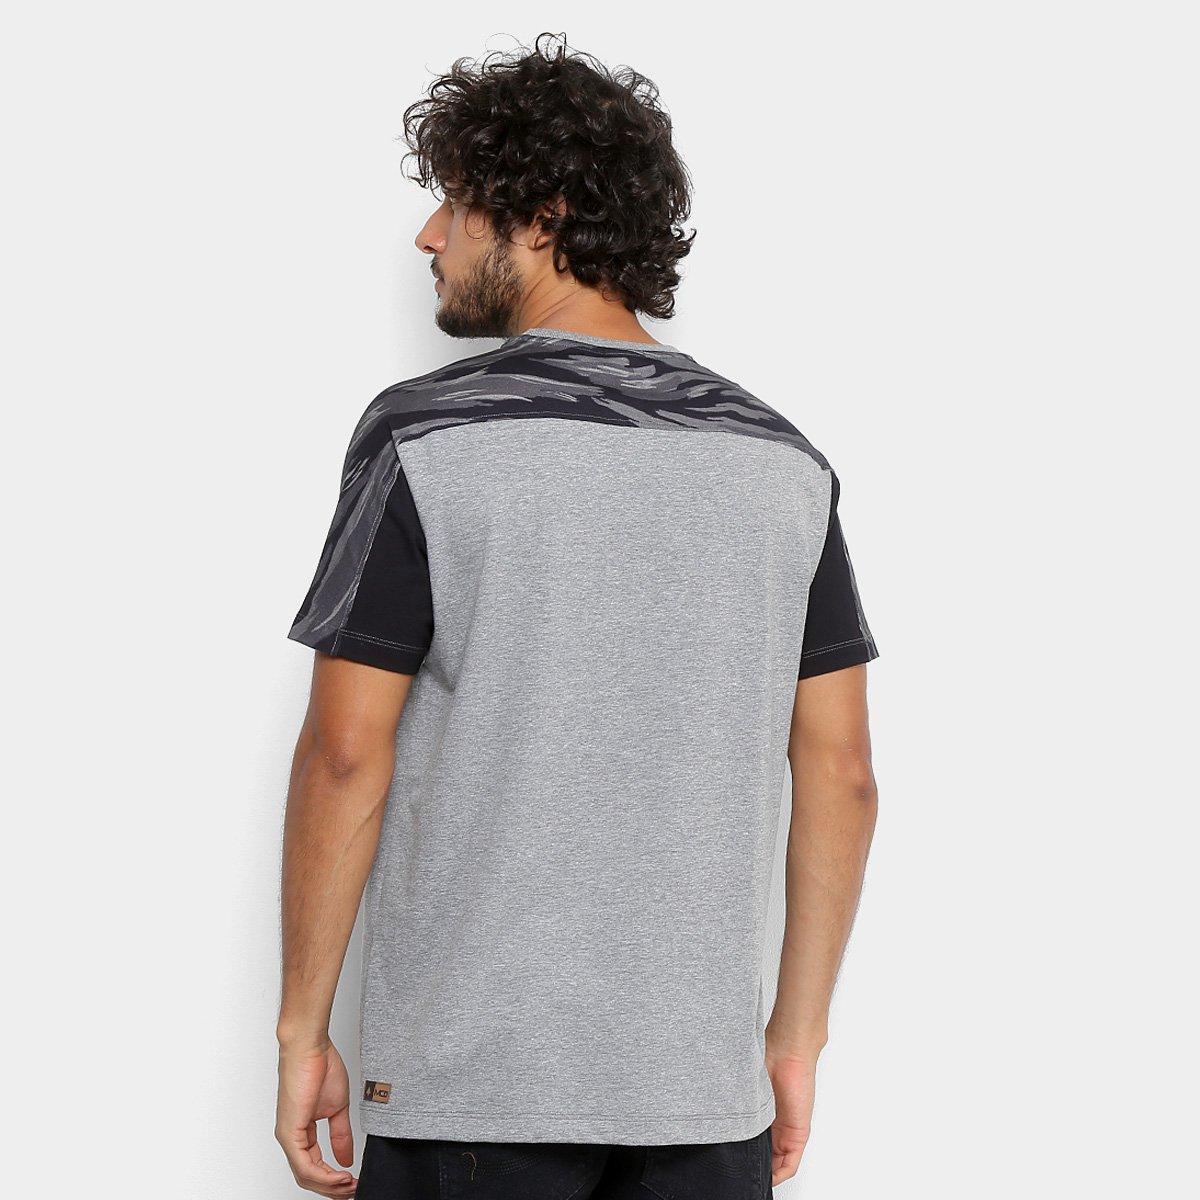 Camiseta MCD Especial Core Masculina  Camiseta MCD Especial Core Masculina  ... b4cc44a92c0